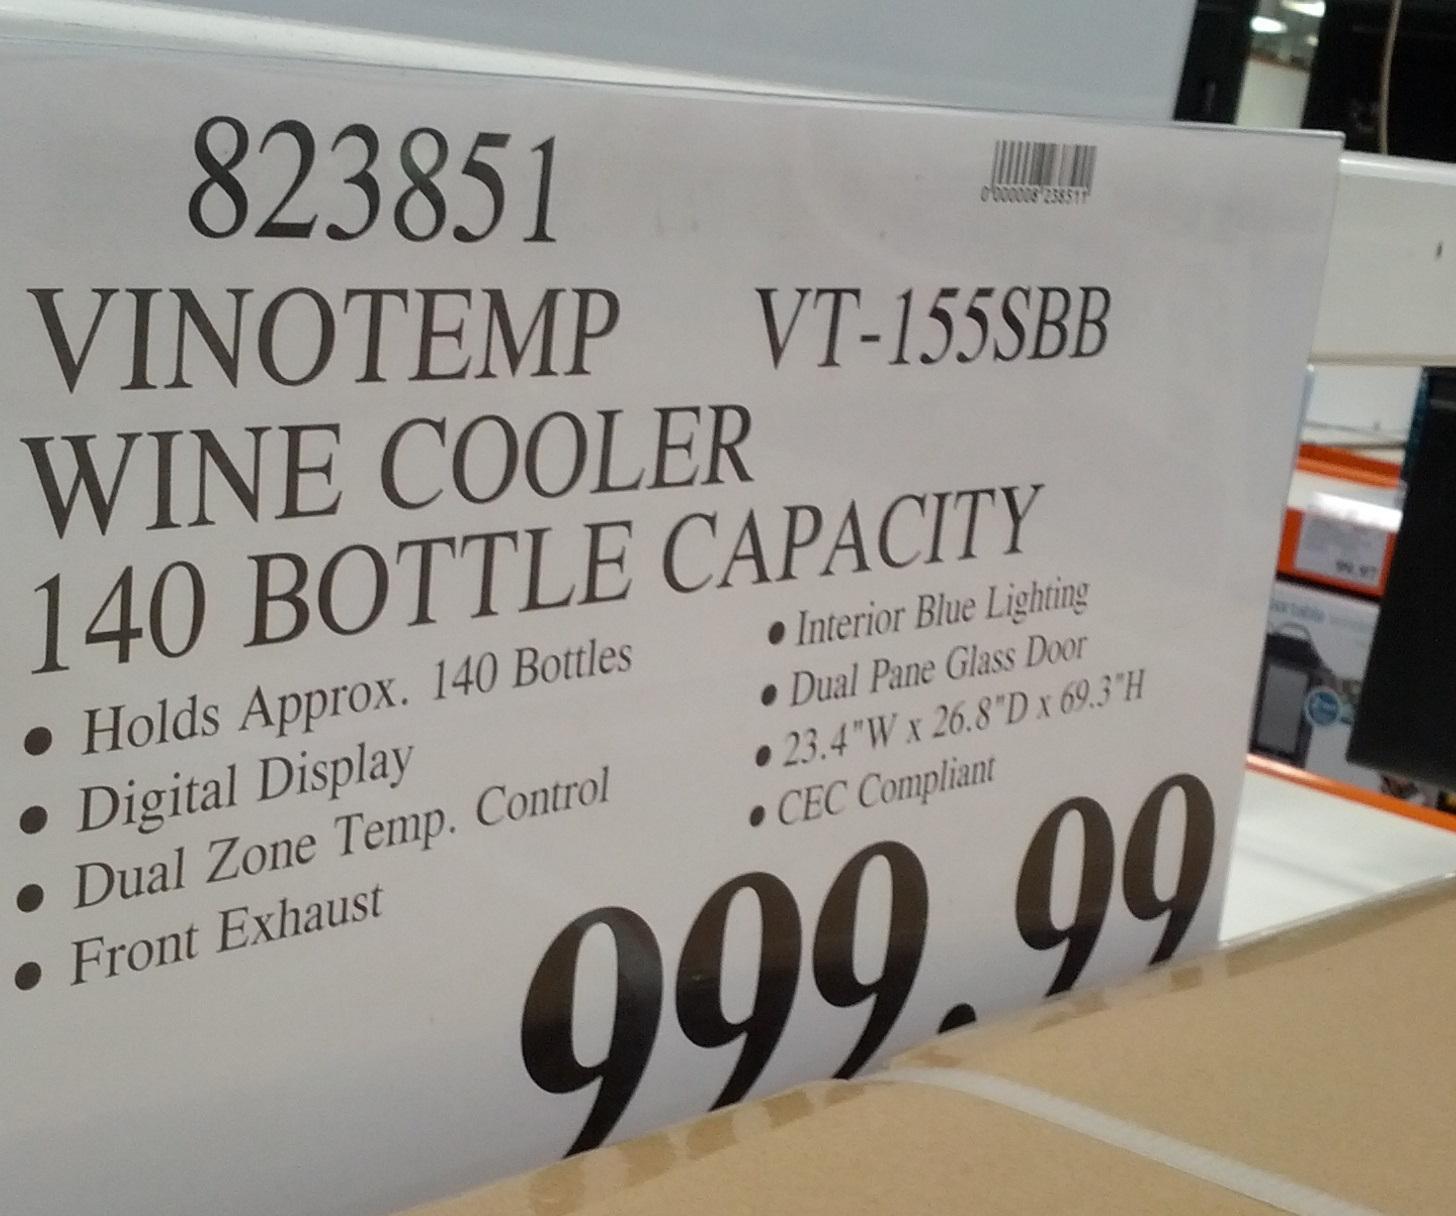 Vinotemp Vt 155sbb 140 Bottle Dual Zone Wine Cooler